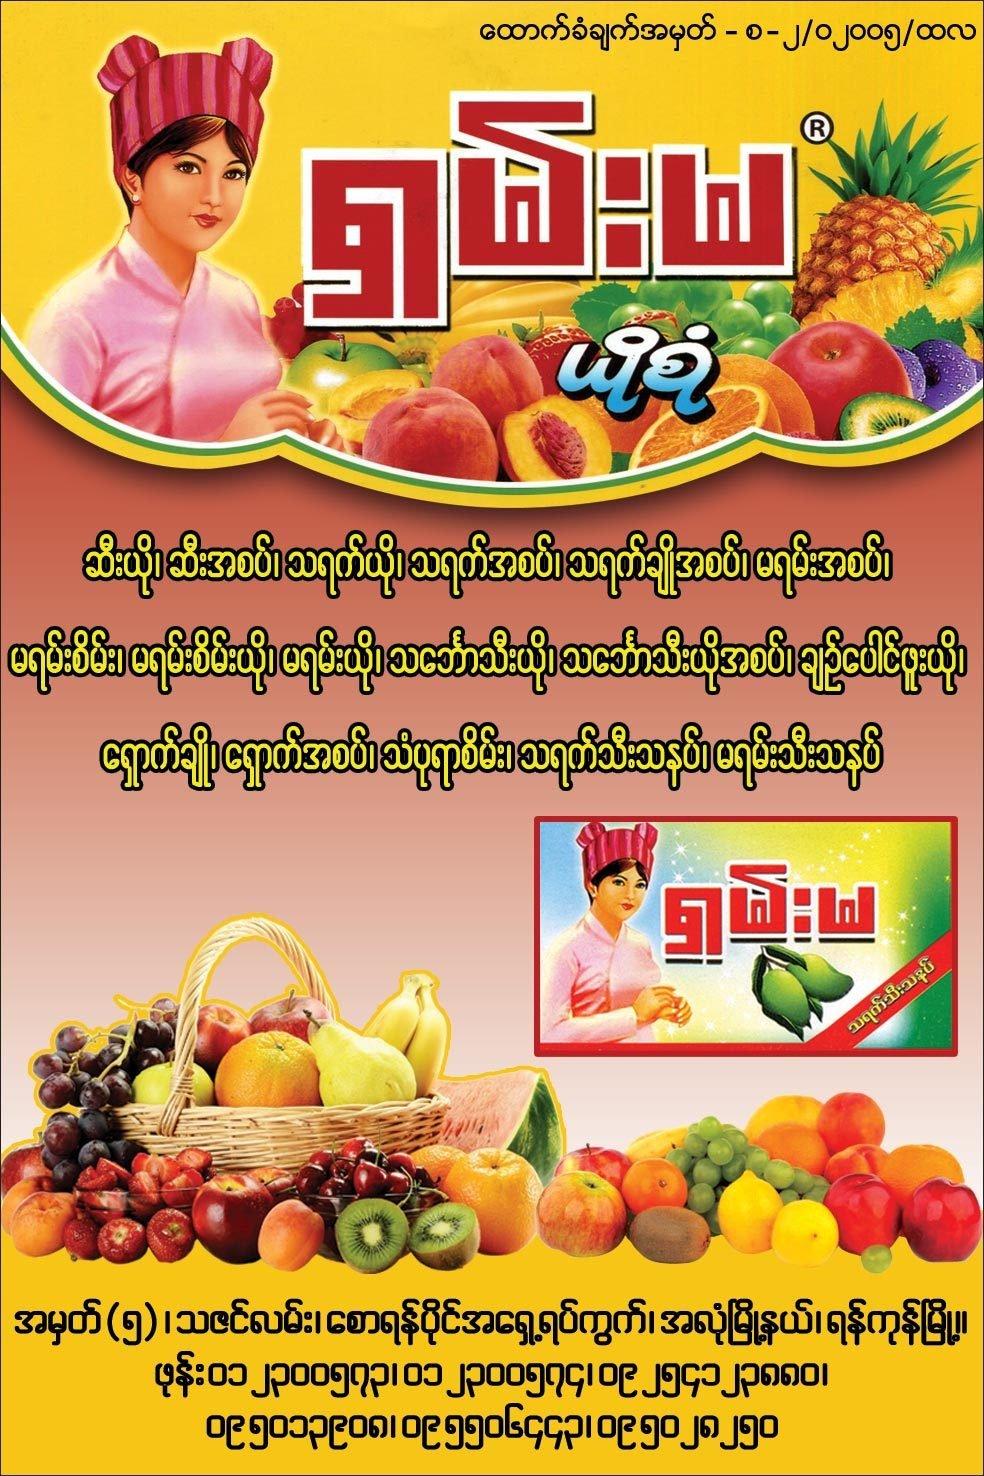 Shan-Ma_Jams(Manu-Dist)_604.jpg